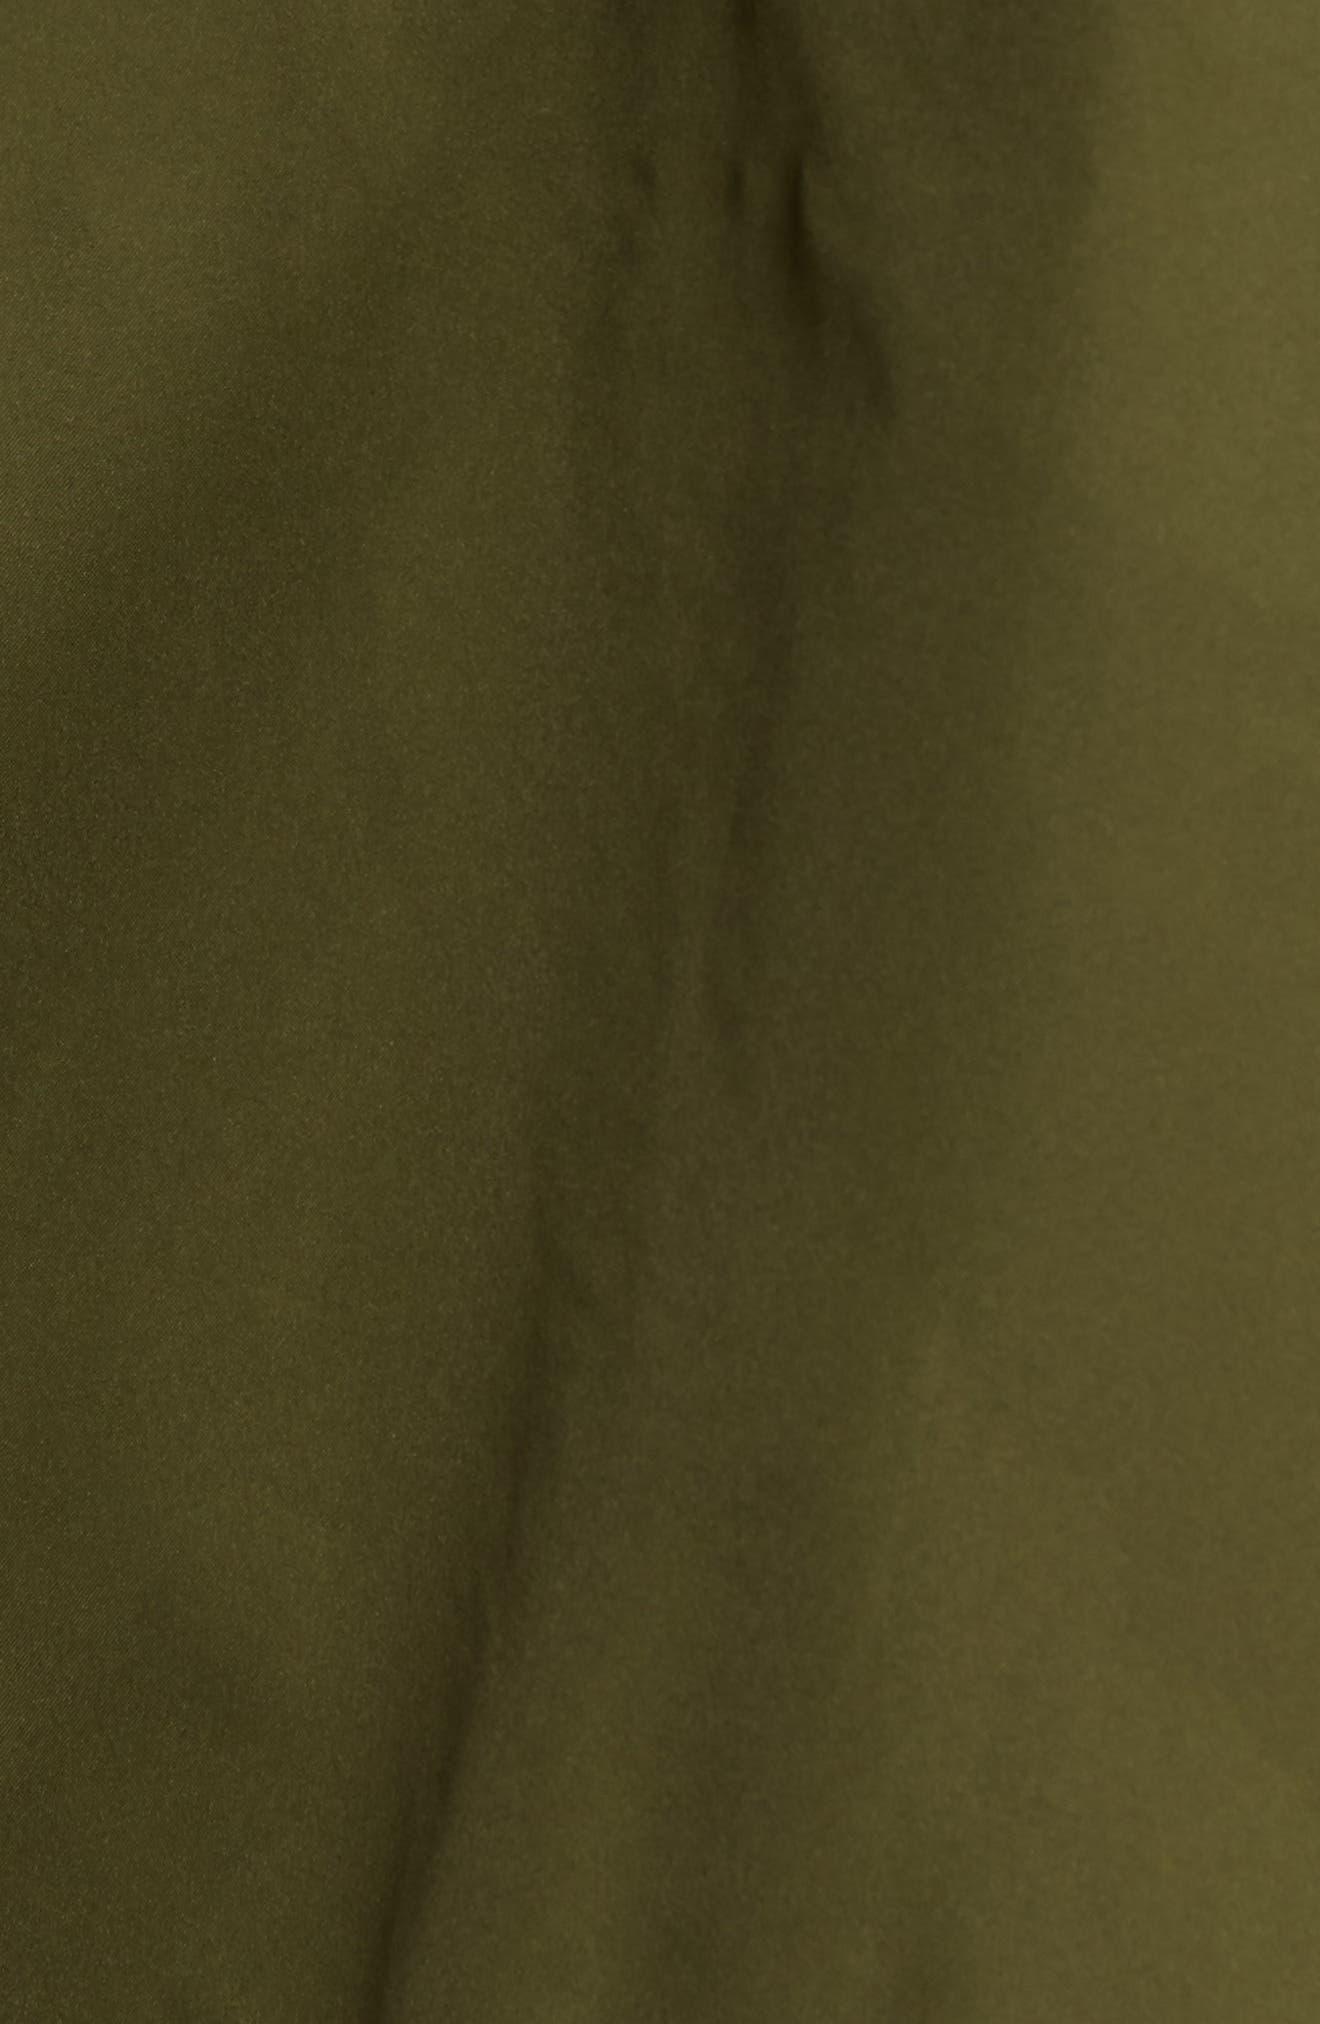 John Rich & Bros. Waterproof Gore-Tex<sup>®</sup> Mountain Jacket,                             Alternate thumbnail 5, color,                             313